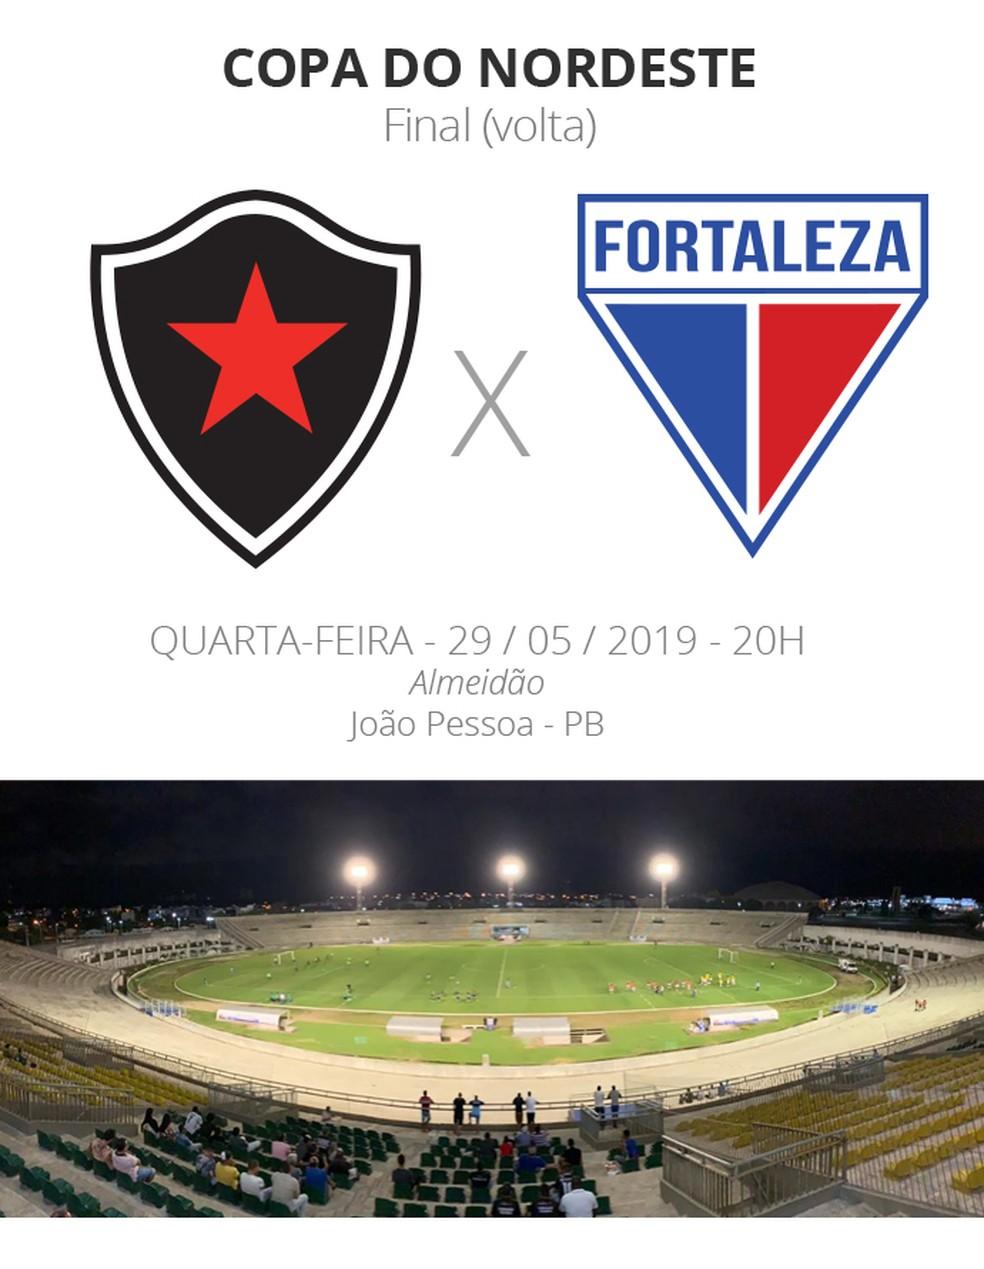 Botafogo Pb X Fortaleza Tudo O Que Voce Precisa Saber Sobre O Jogo De Volta Da Decisao Copa Do Nordeste Ge